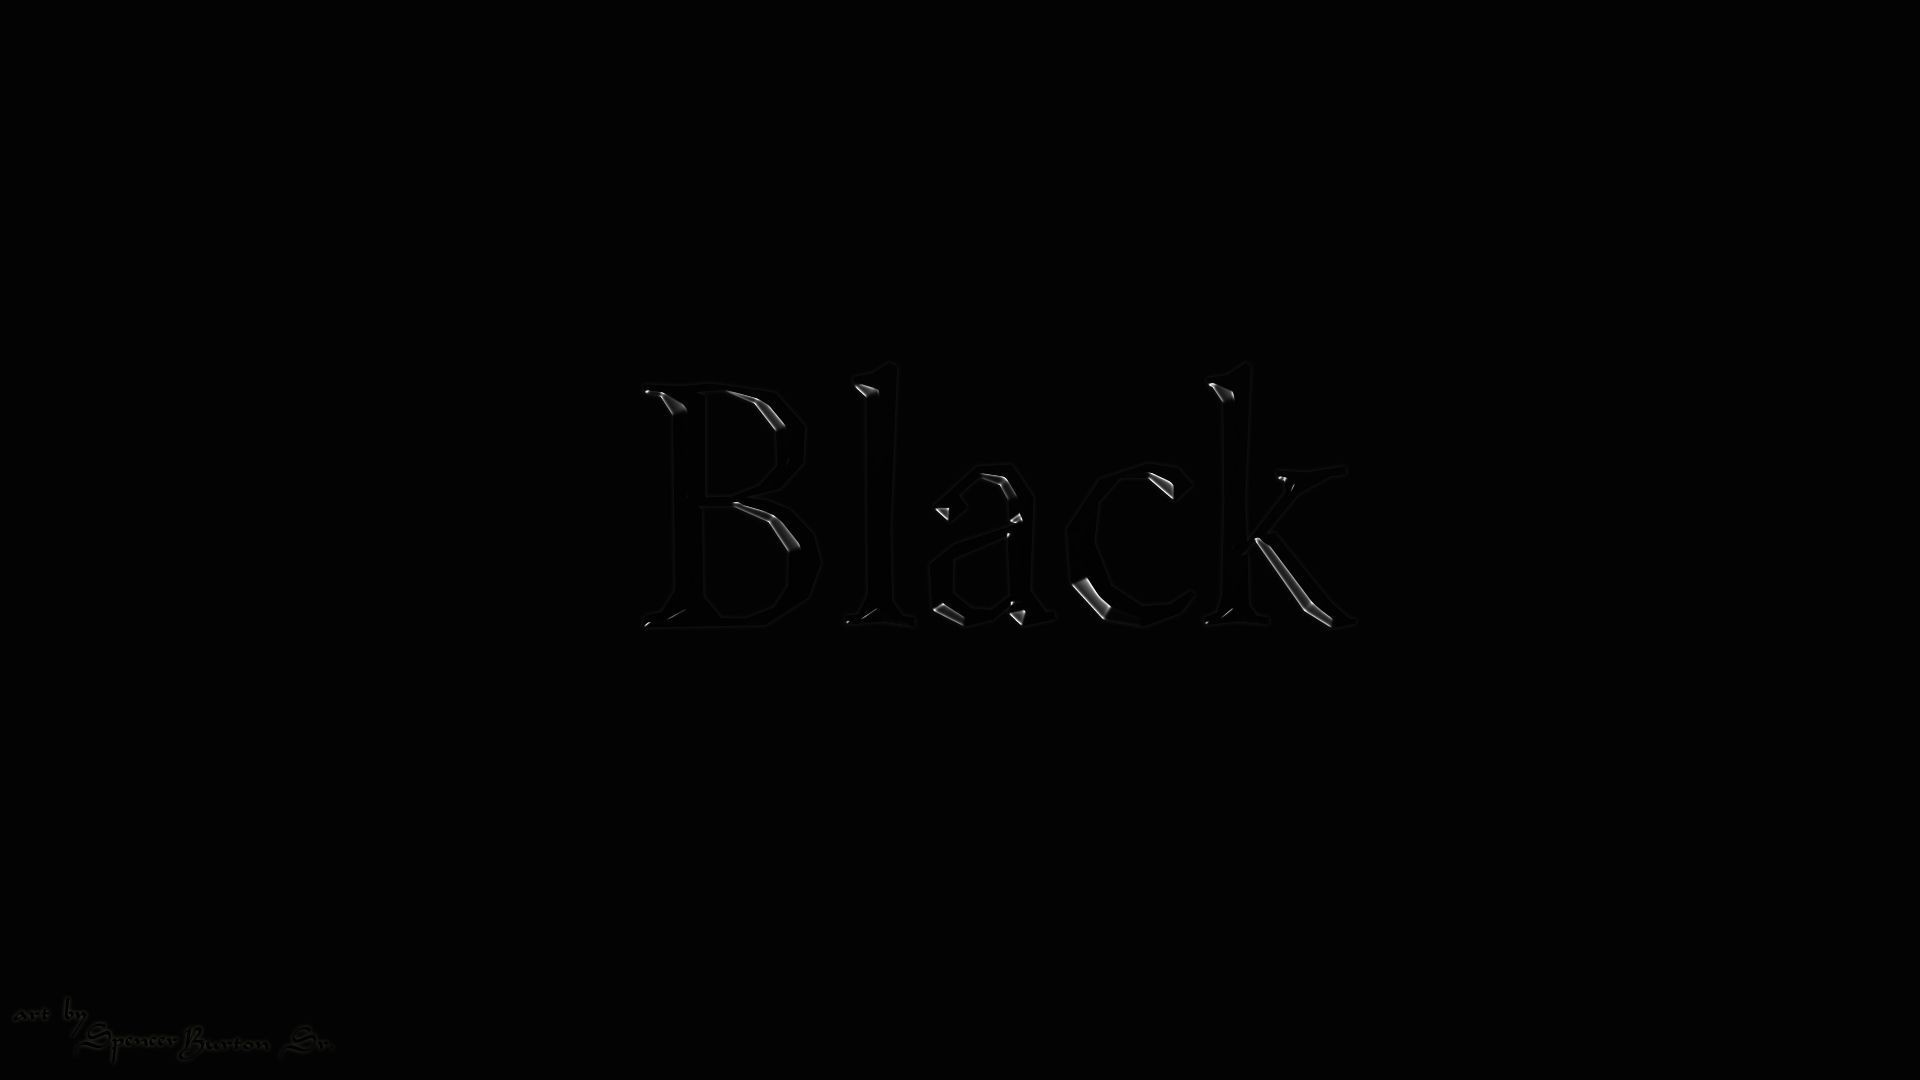 … Black Wallpapers 1080p Wallpaper Cave Pure Black Wallpaper